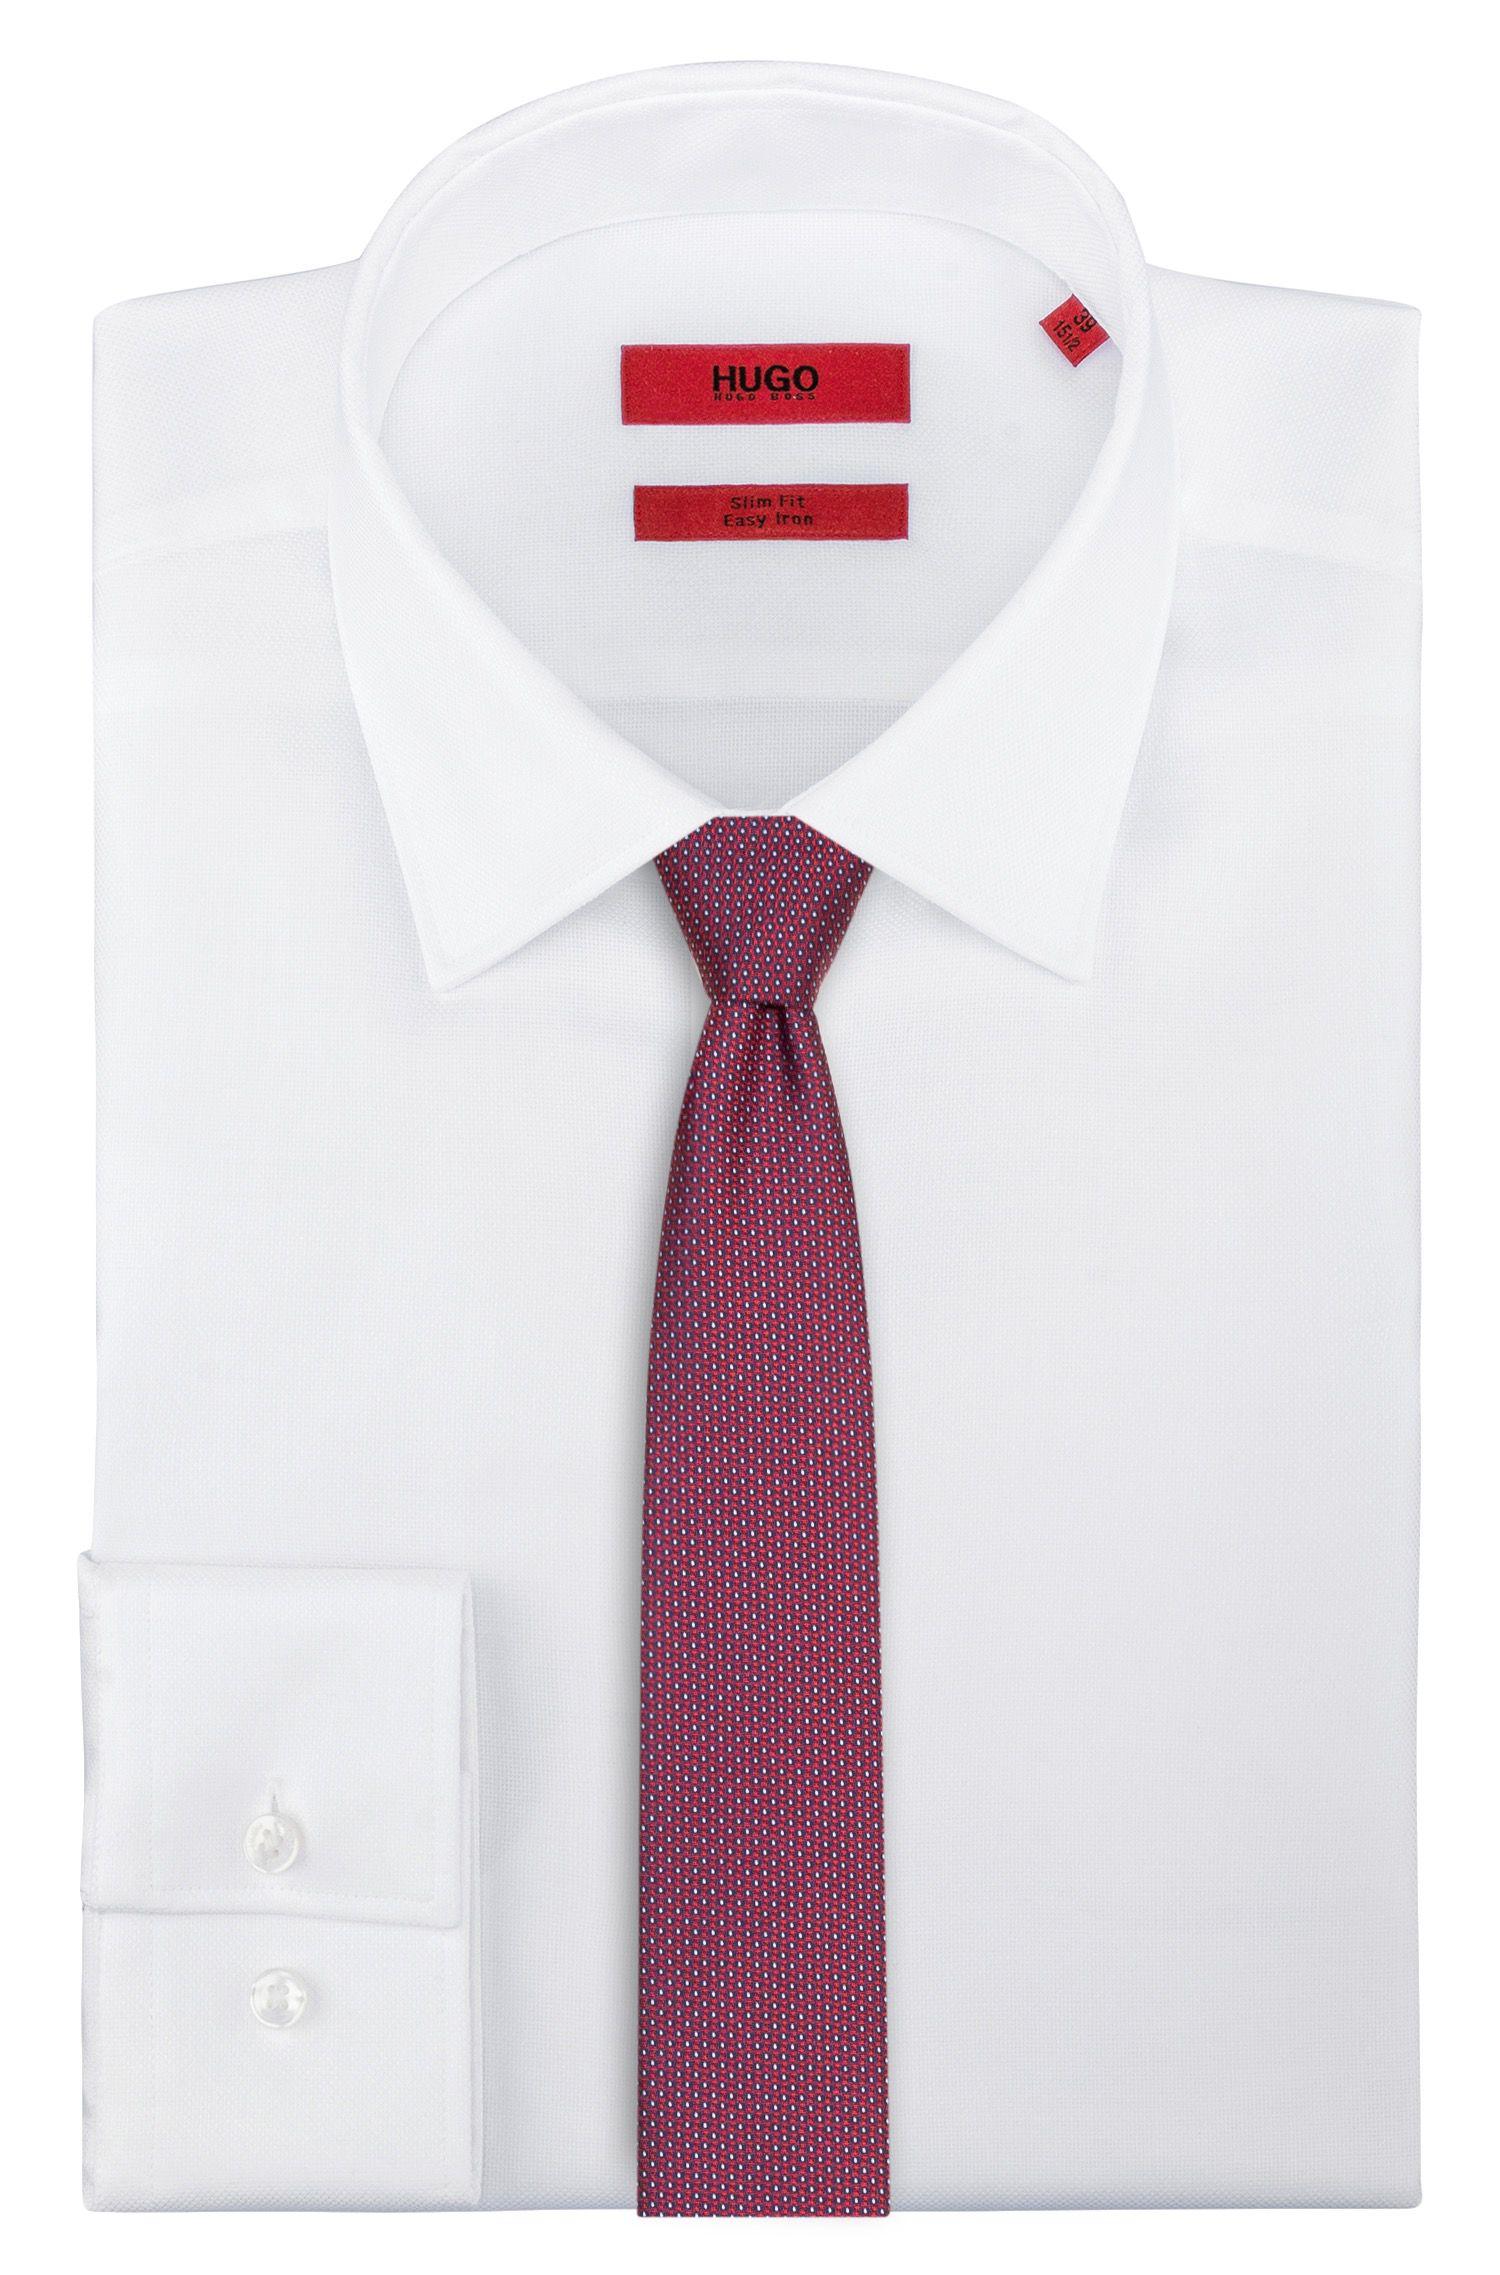 Hugo Boss - Gerade geschnittene Krawatte aus Seide mit dezentem Muster - 2